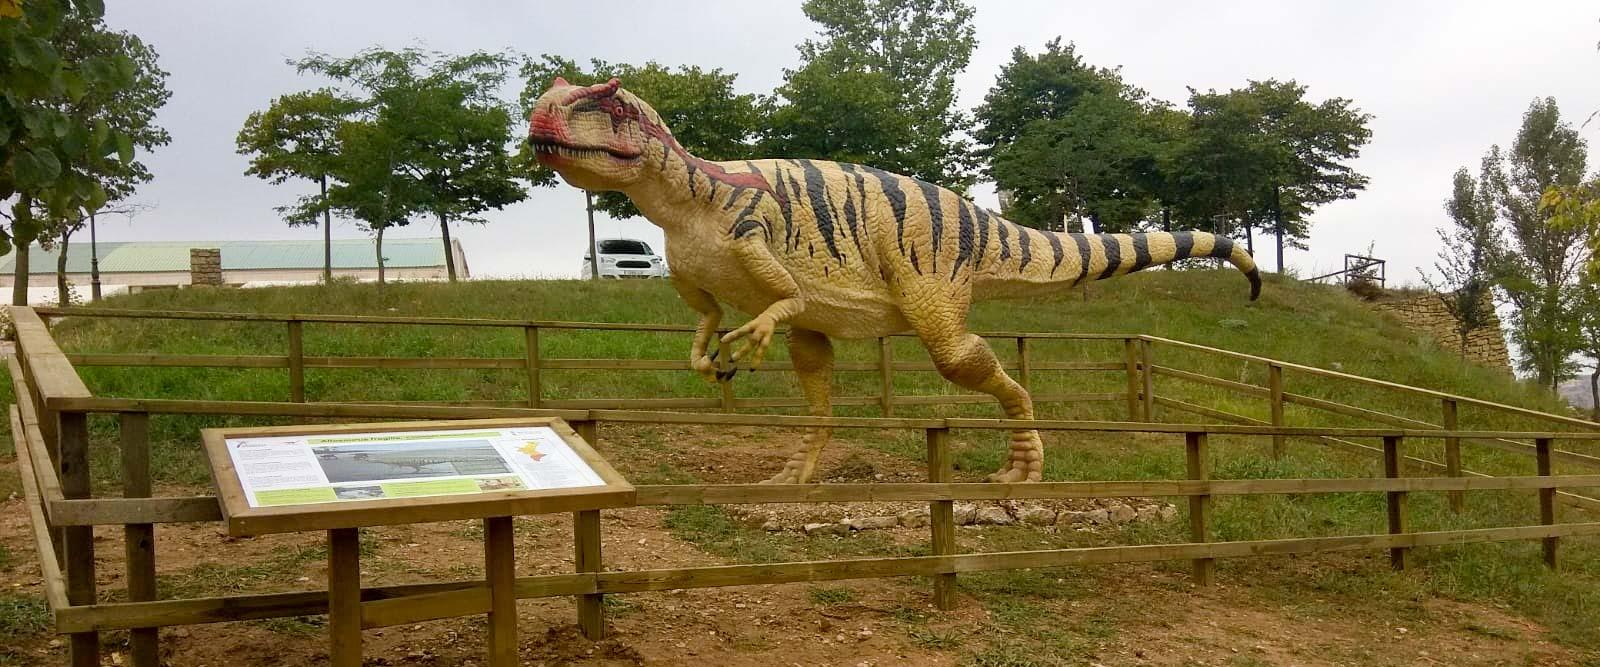 Dinosaurios valencia